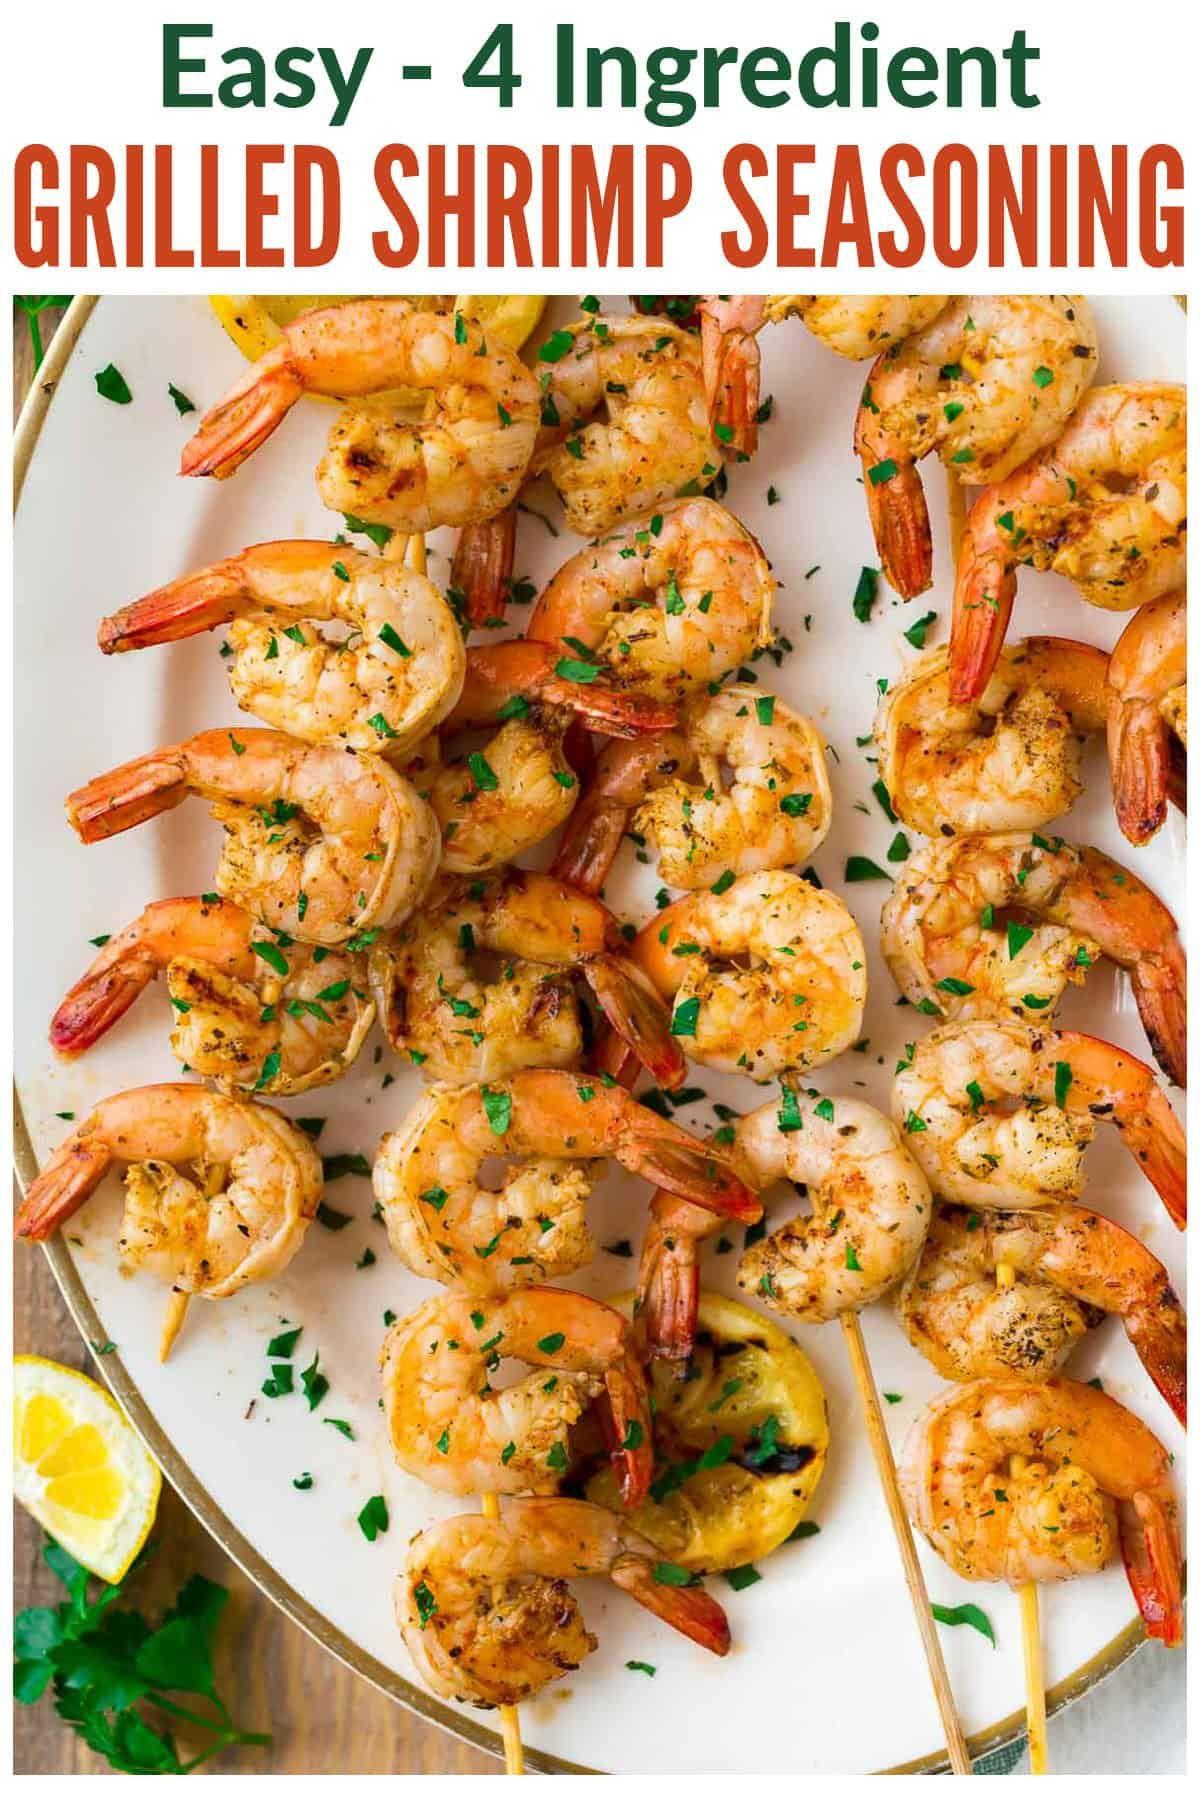 Grilled Shrimp Seasoning